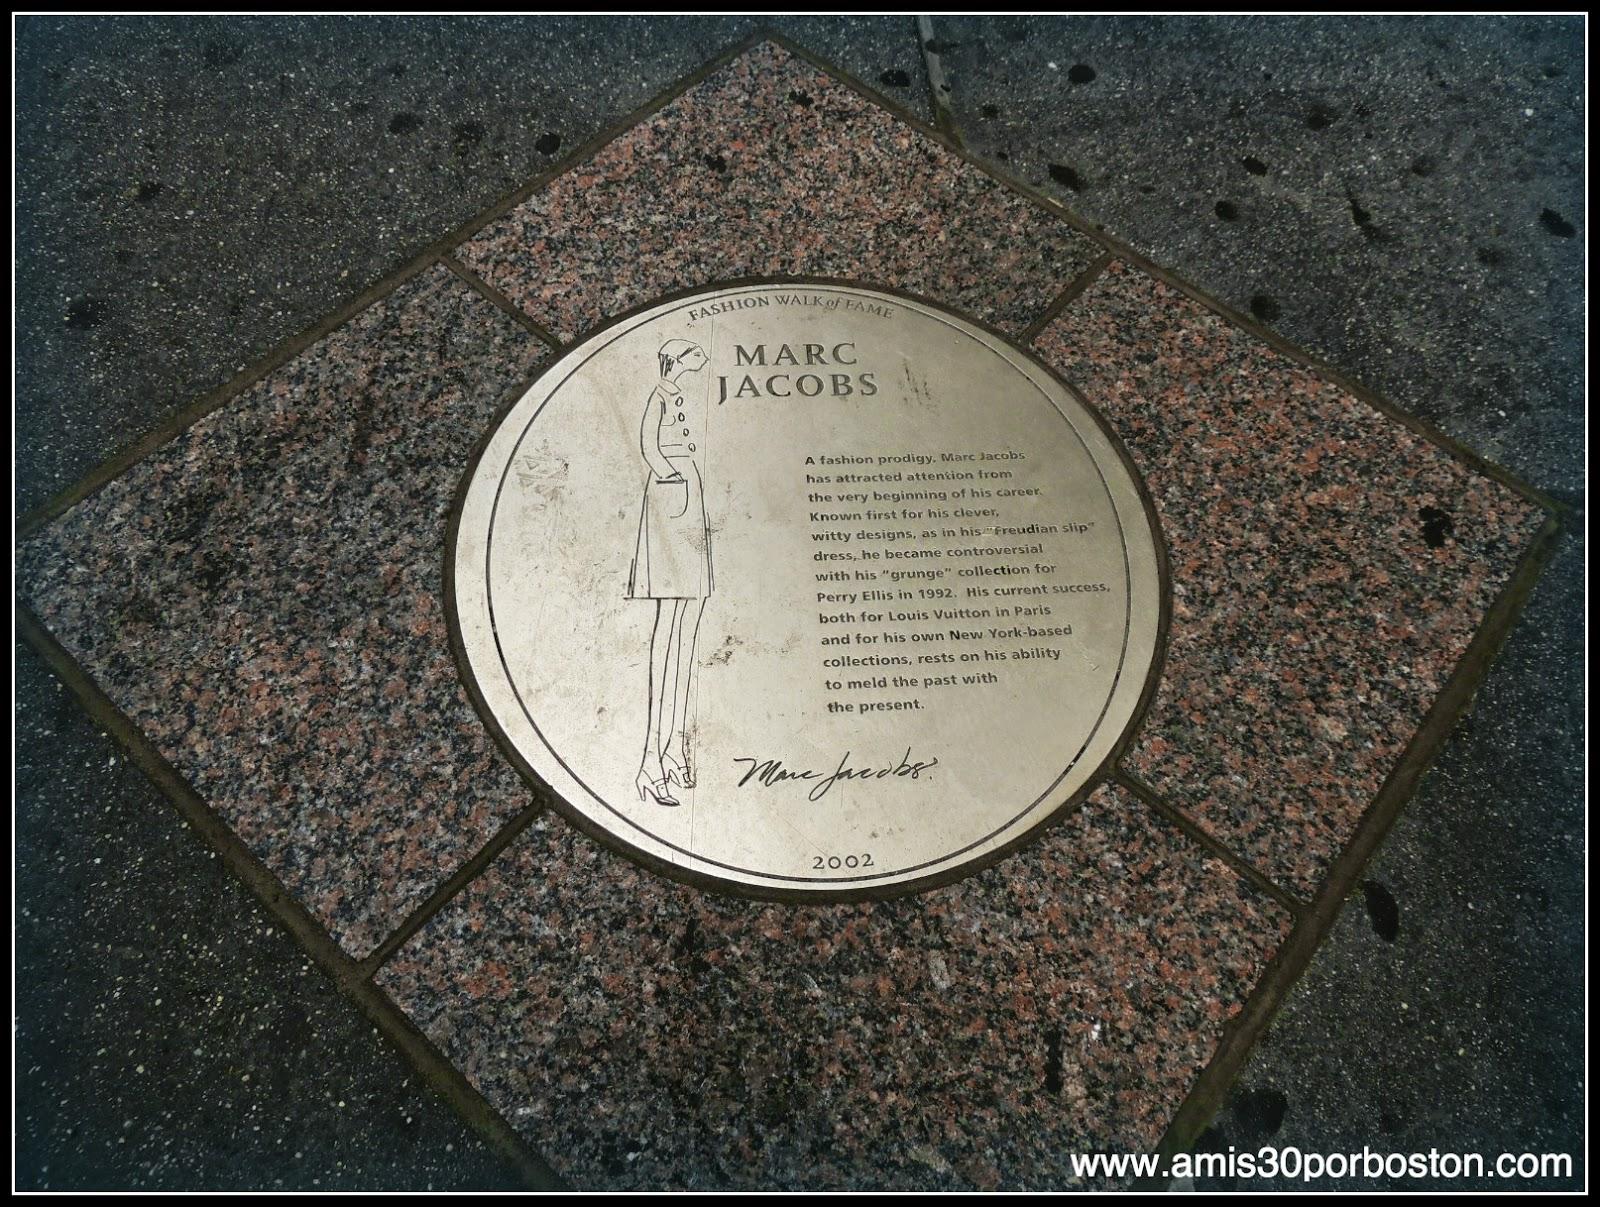 Segunda Visita a Nueva York: Paseo de la Fama